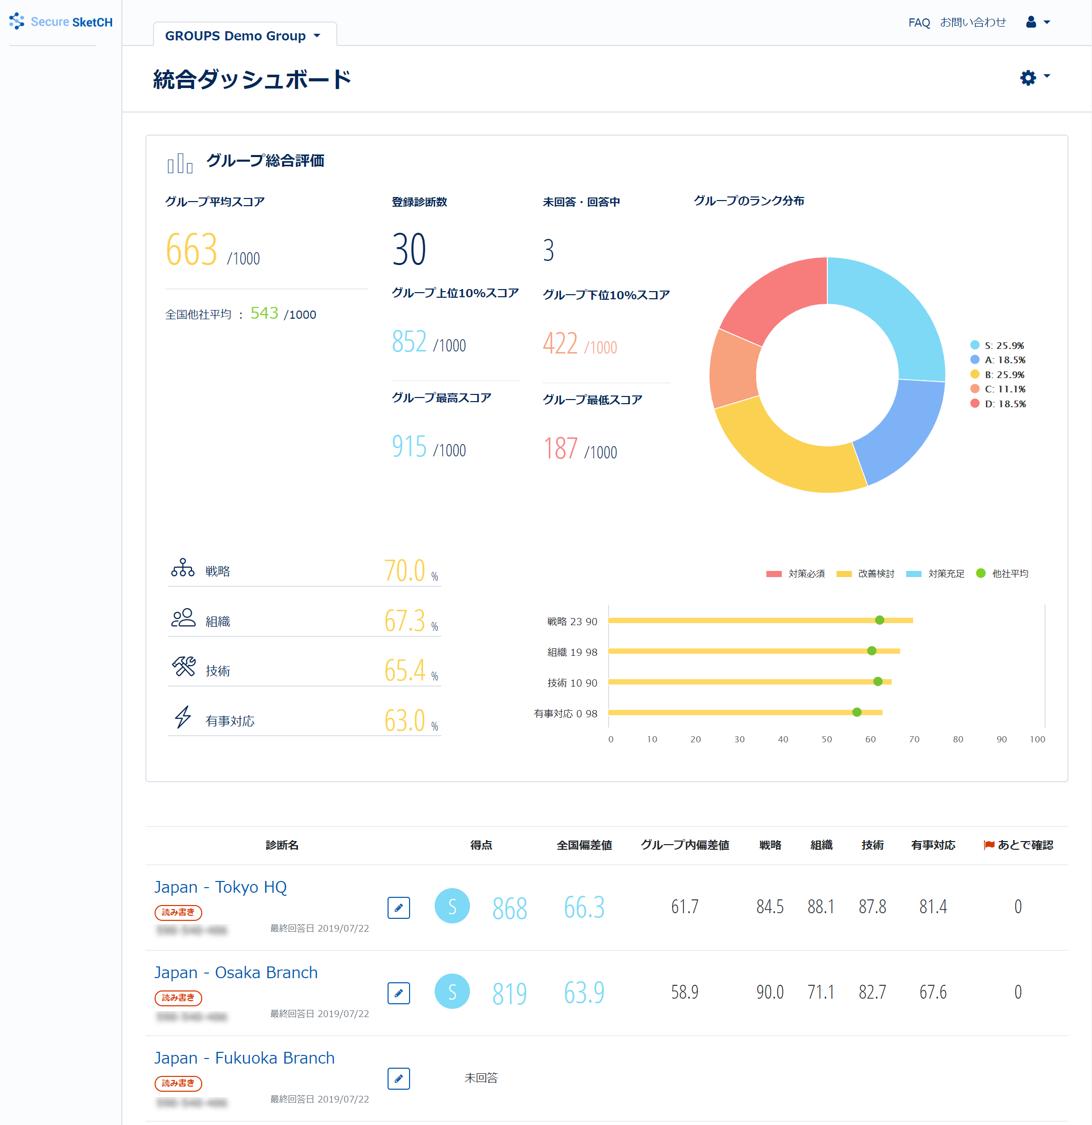 Secure SketCH GROUPSプラン」の「統合ダッシュボード機能」画面(イメージ)1